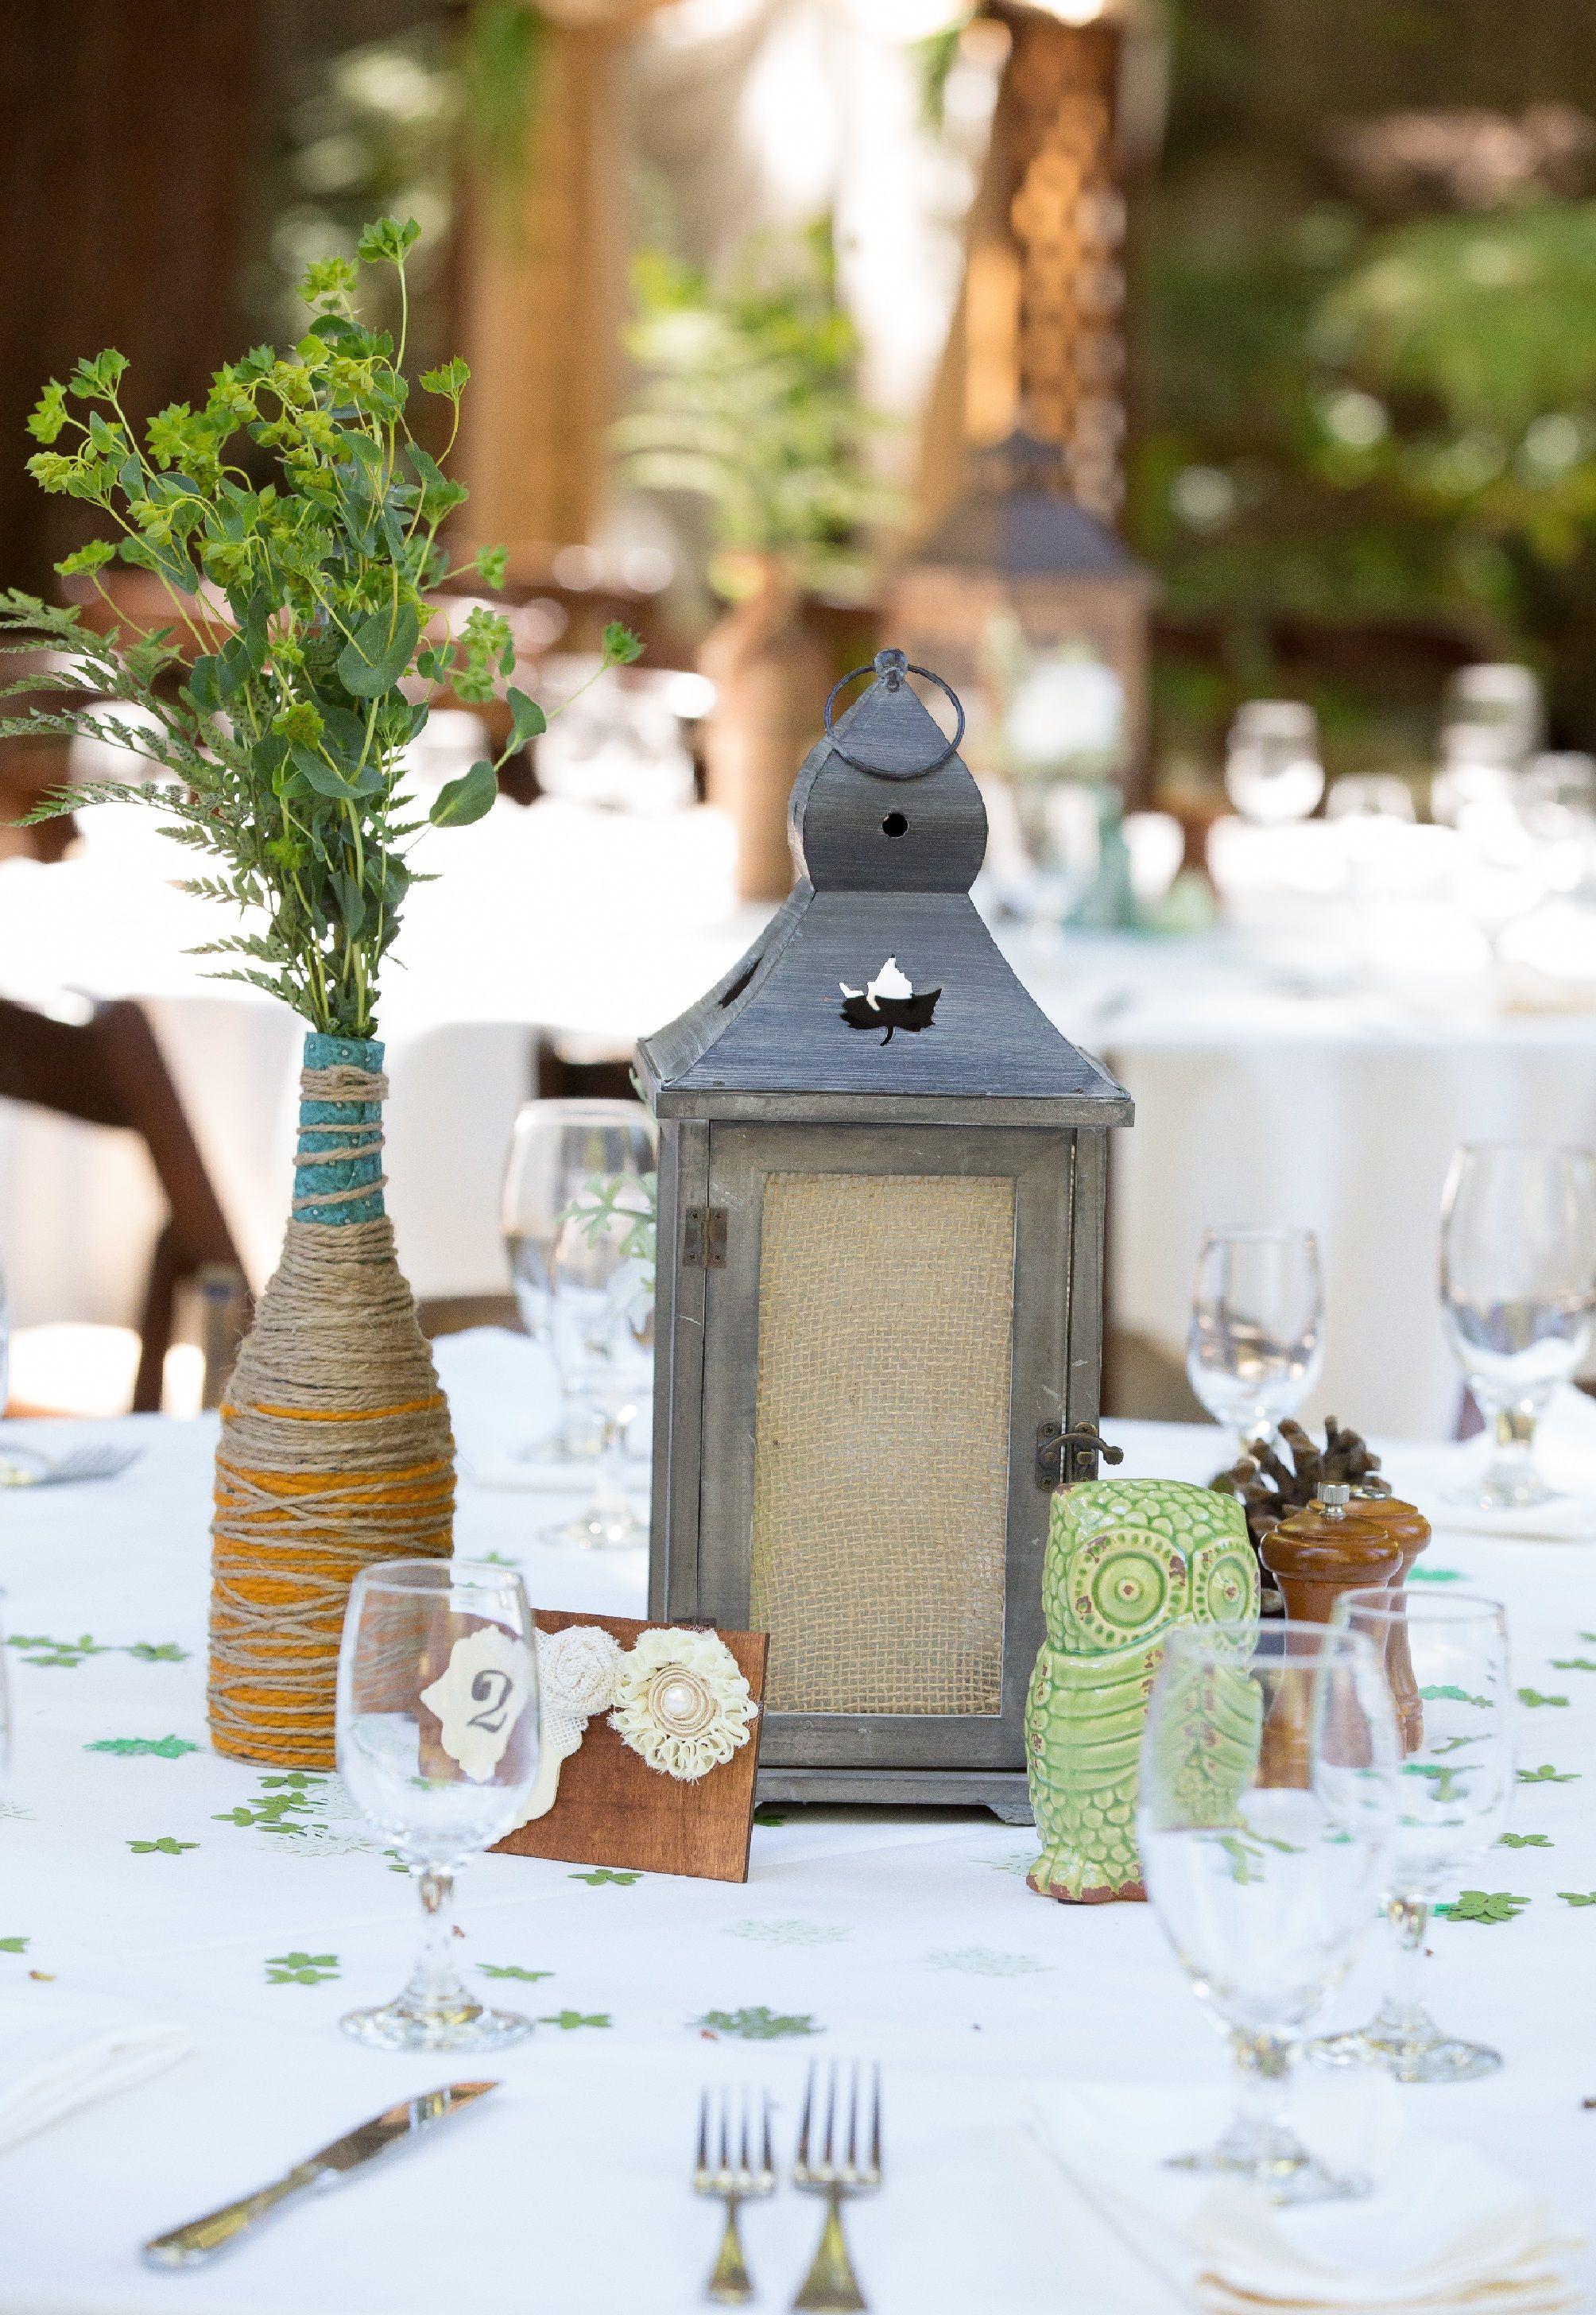 Rustic Redwood Wedding table centerpiece Lantern DIY wine bottle